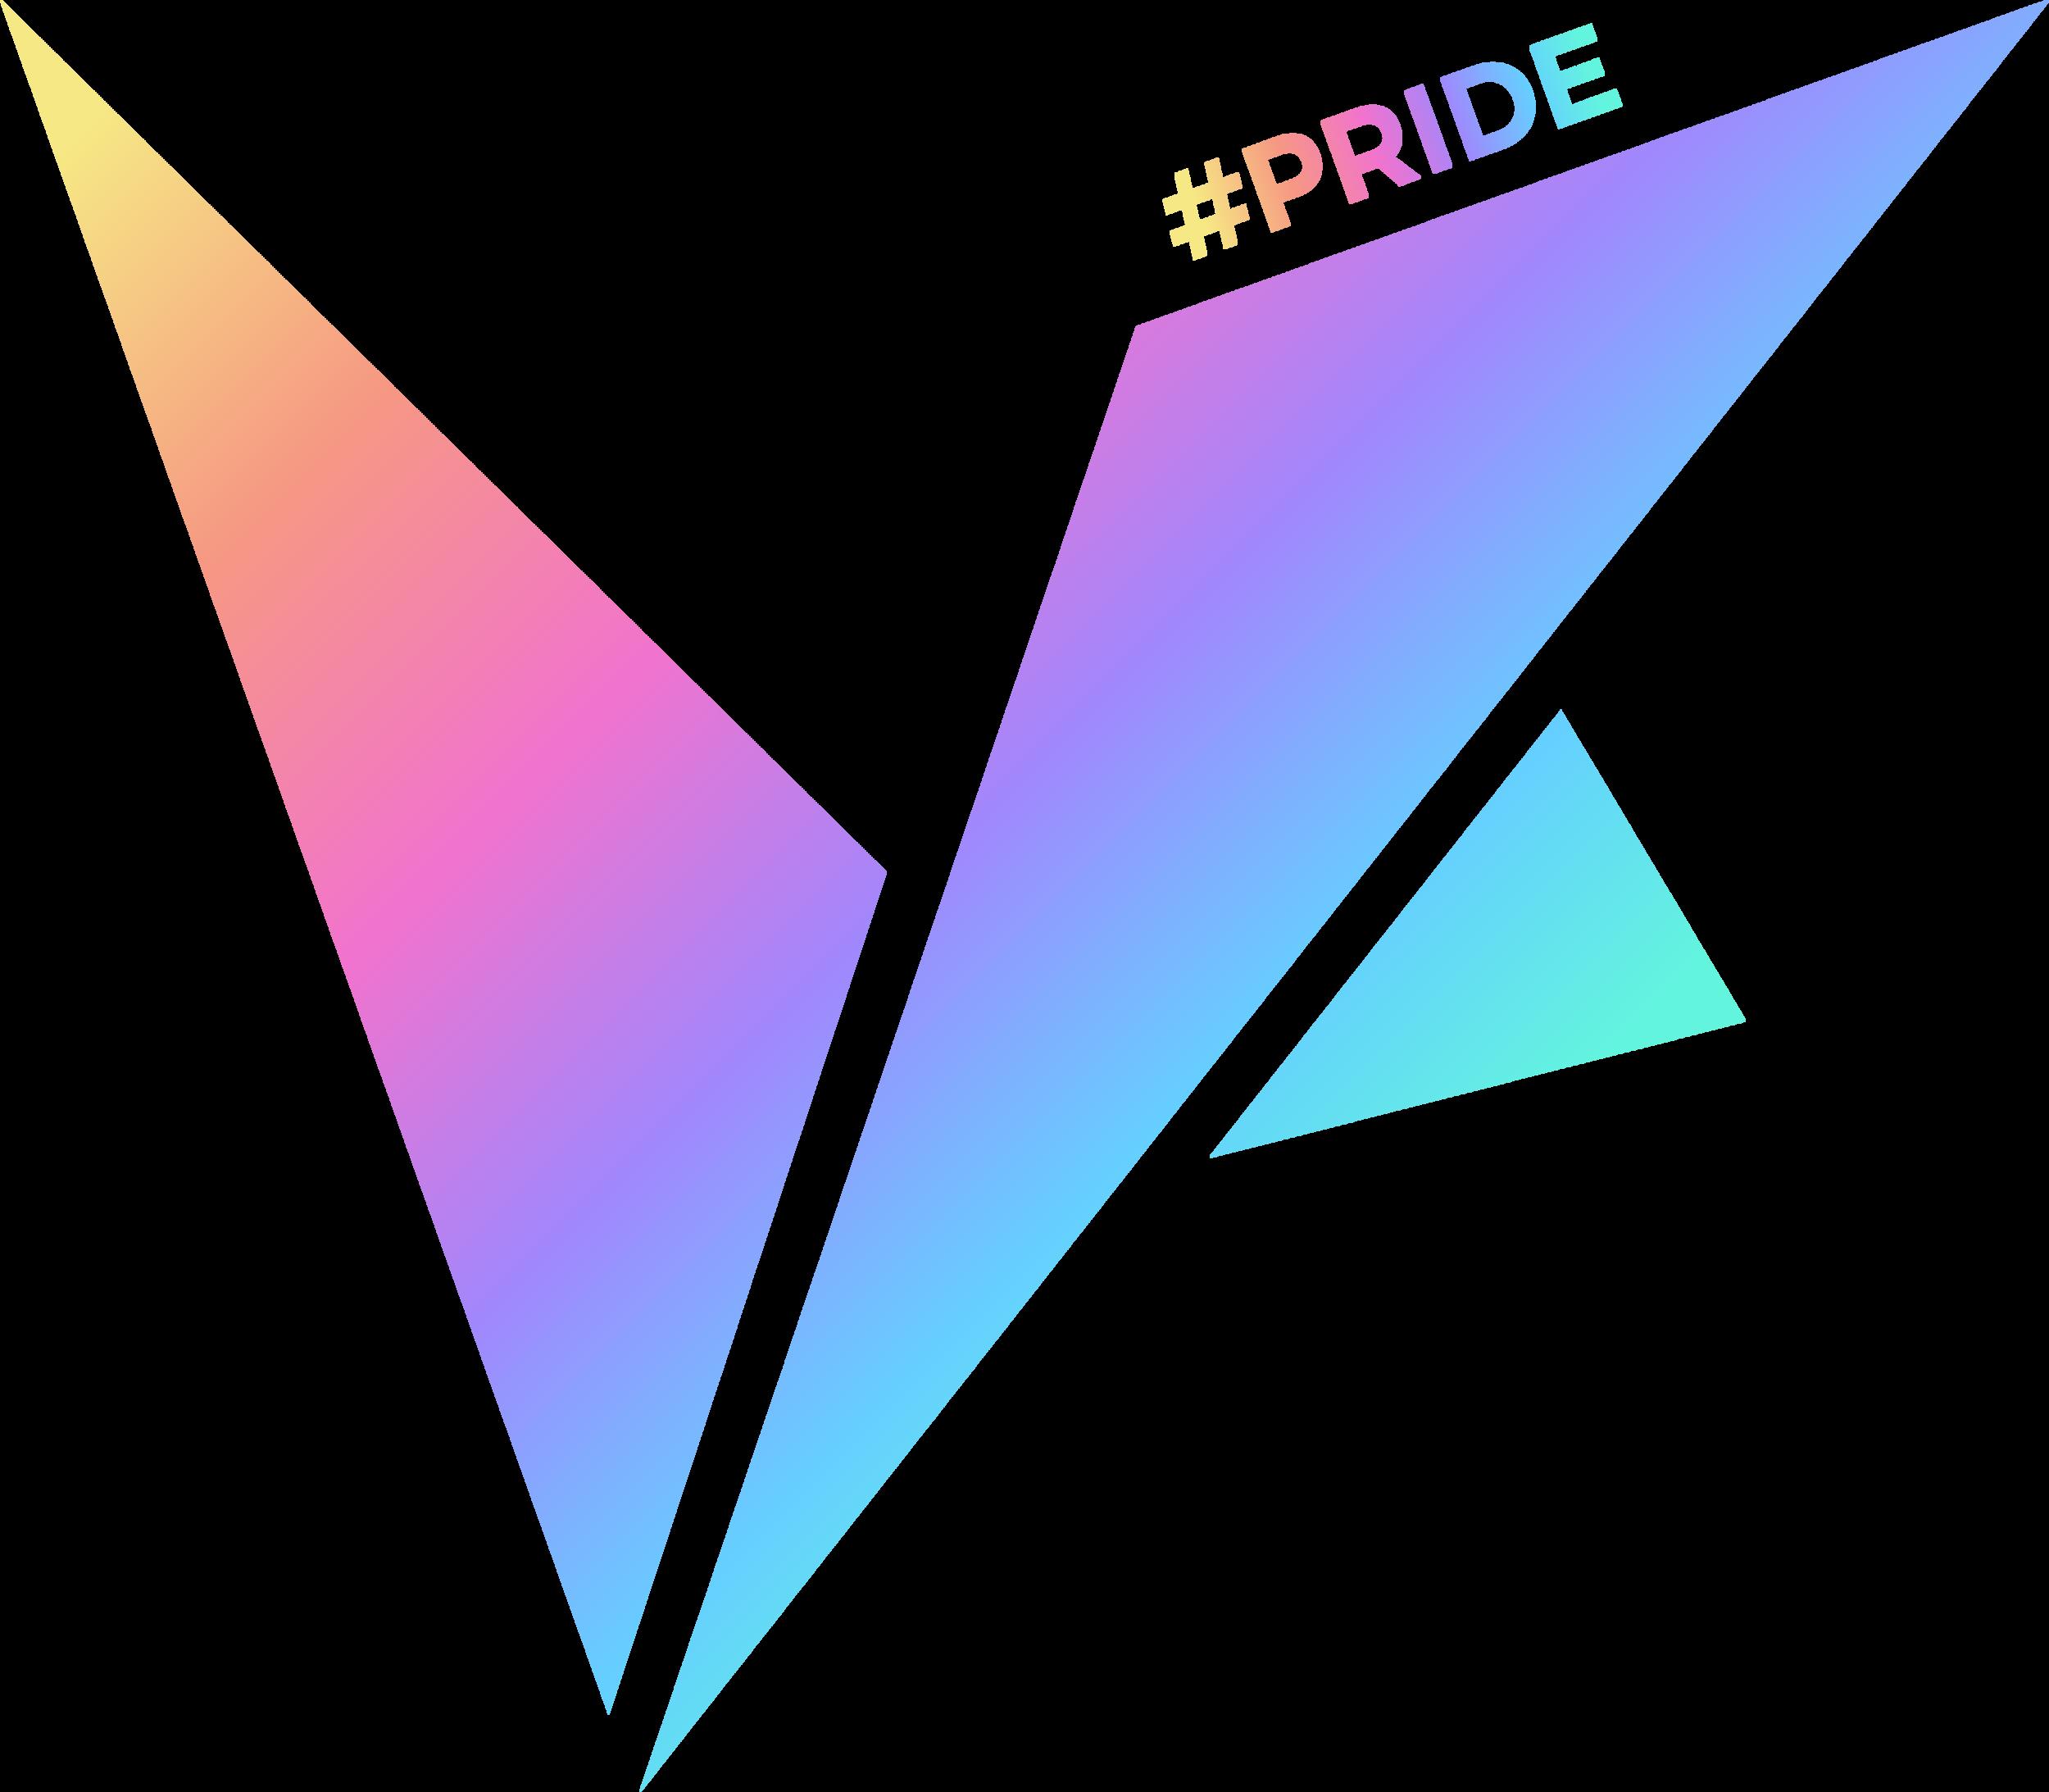 PersonalLogo_v2_Bird_pride.png